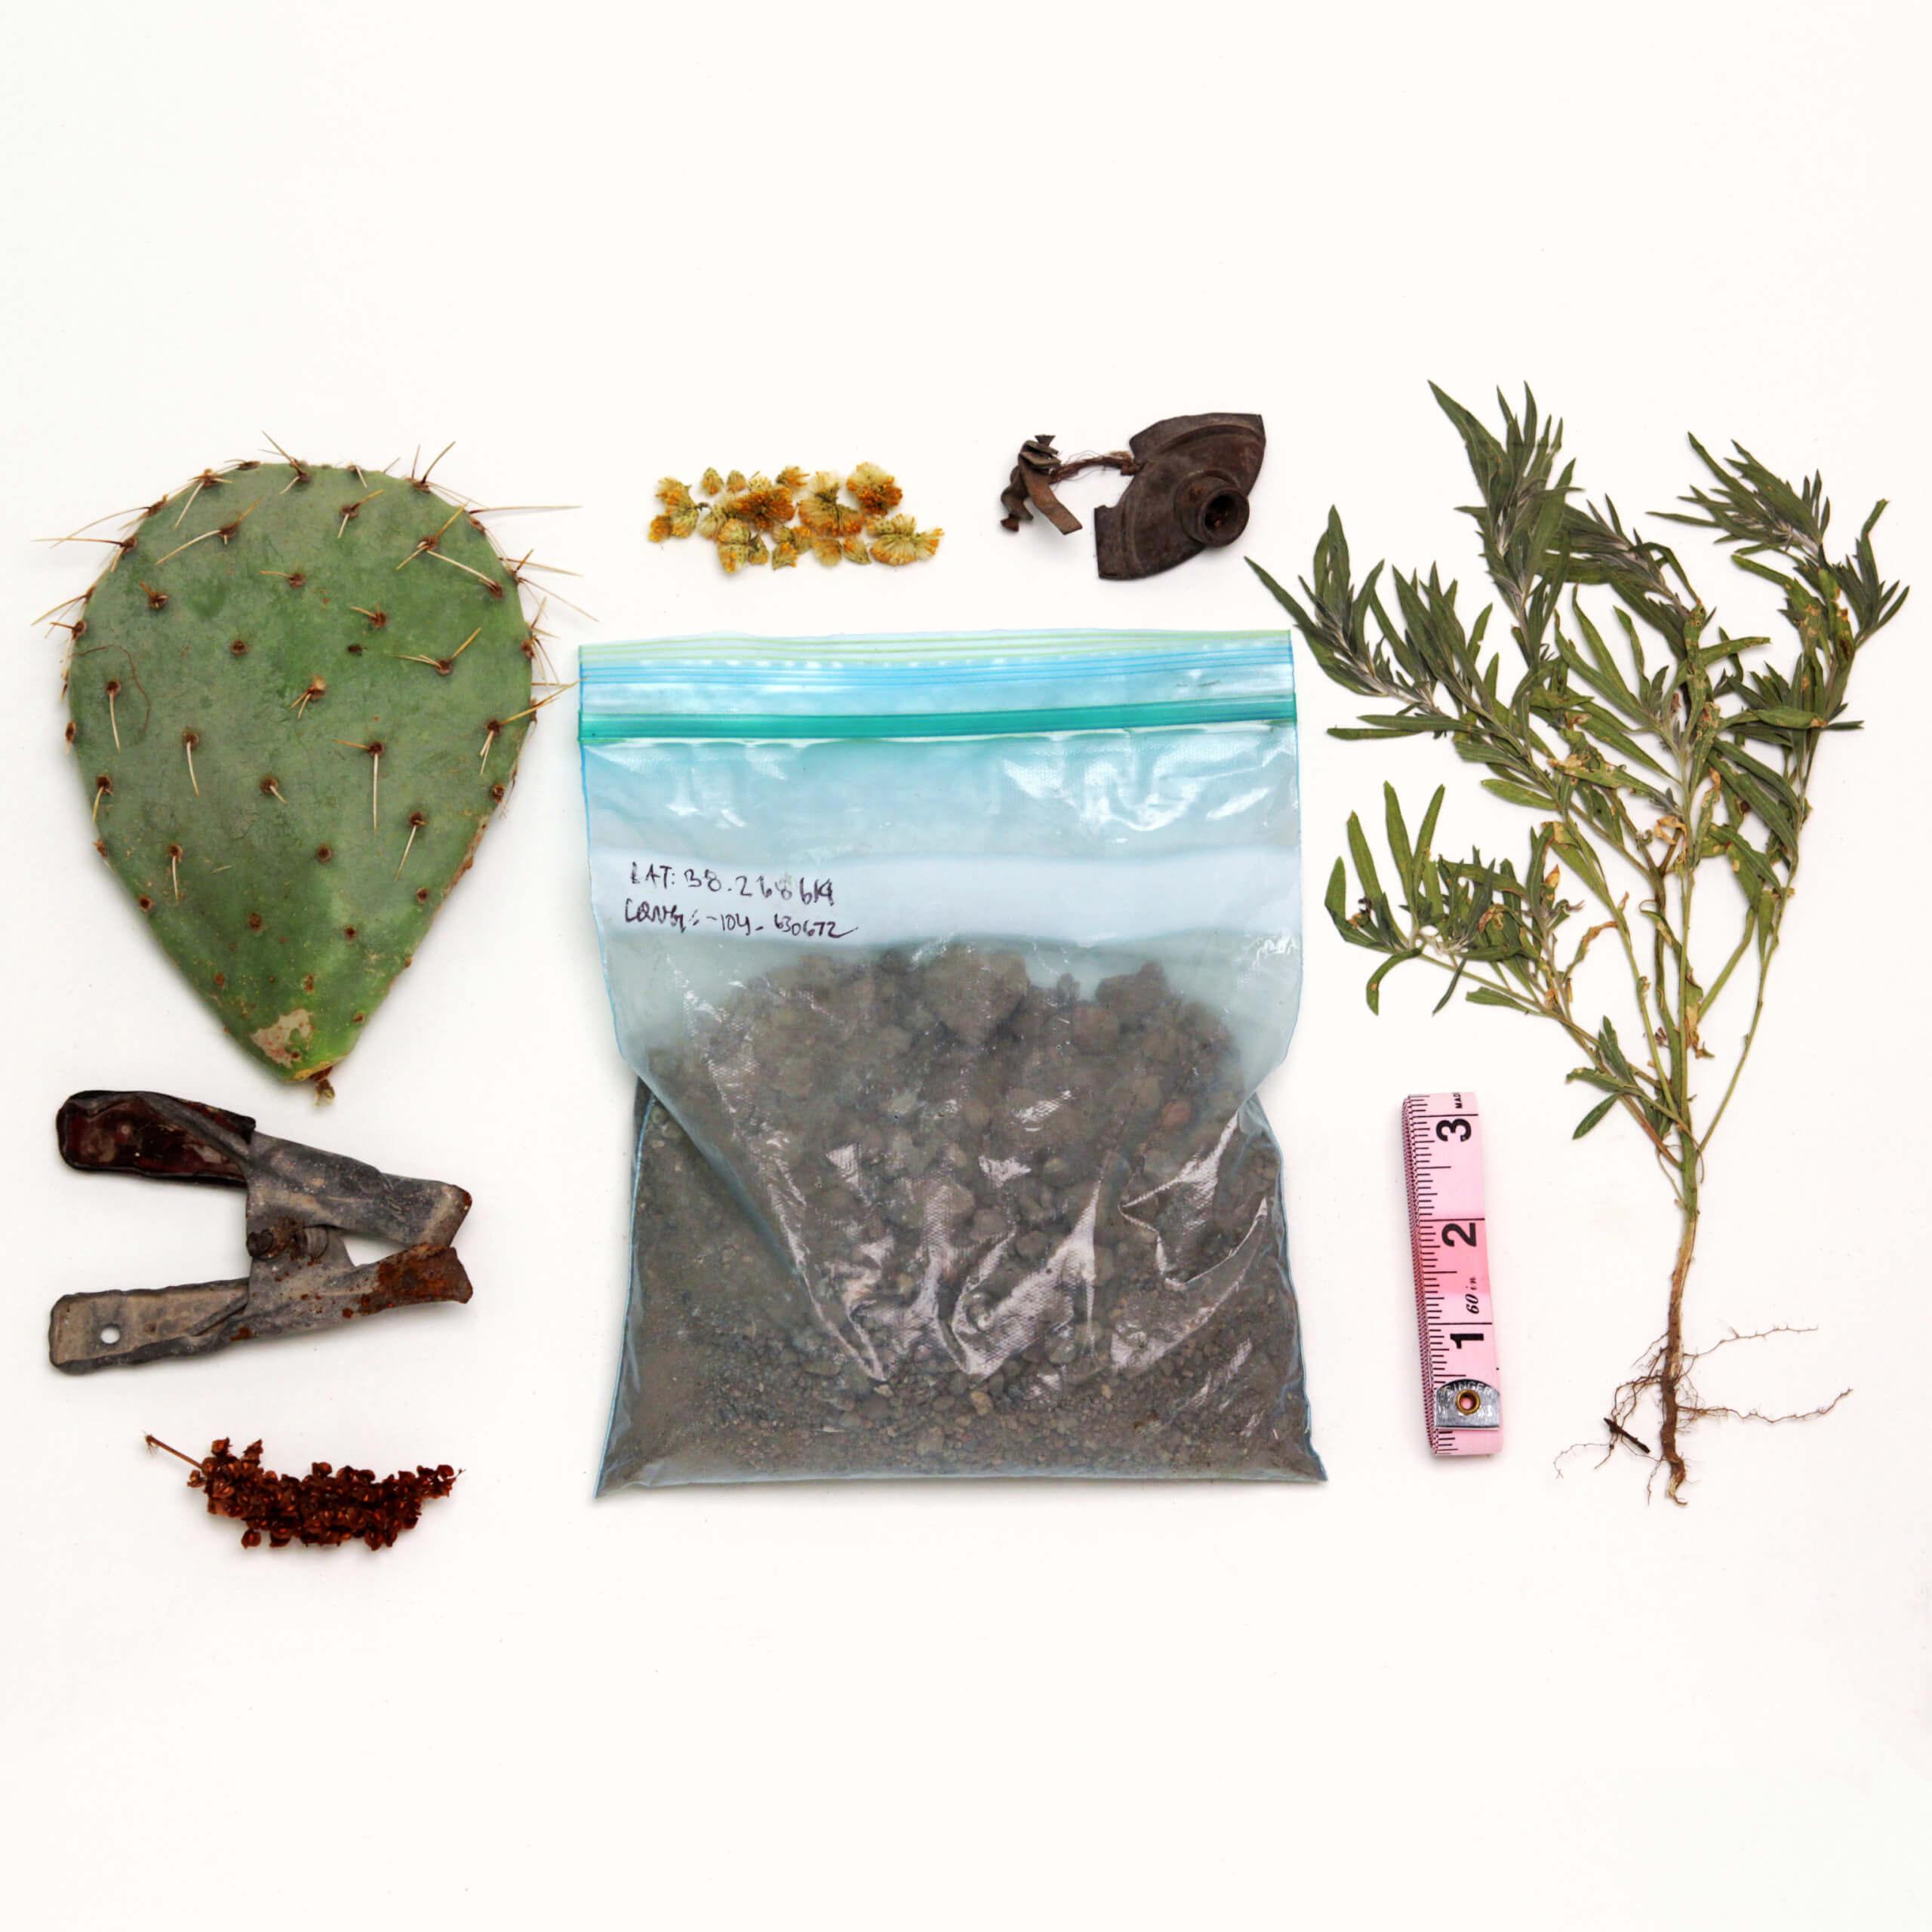 Desert ArtLAB Ecologies of Resistance